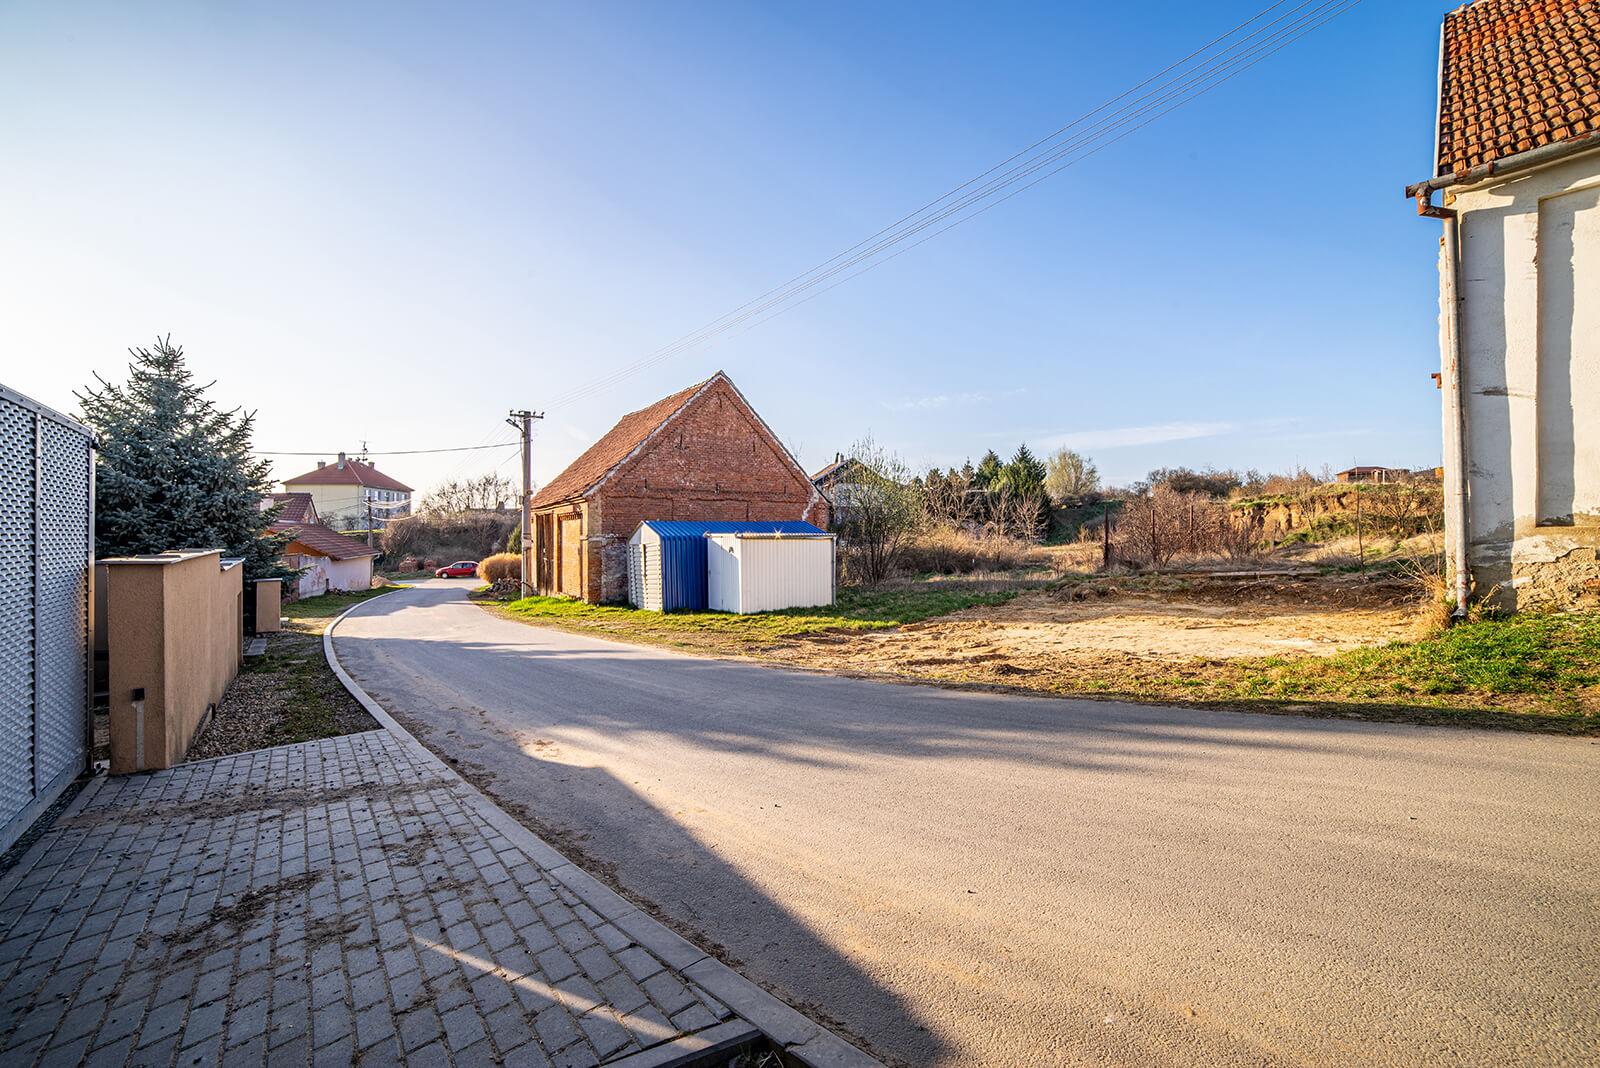 Prodej stavebního pozemku, 335m², Medlov, 20 km od Brna